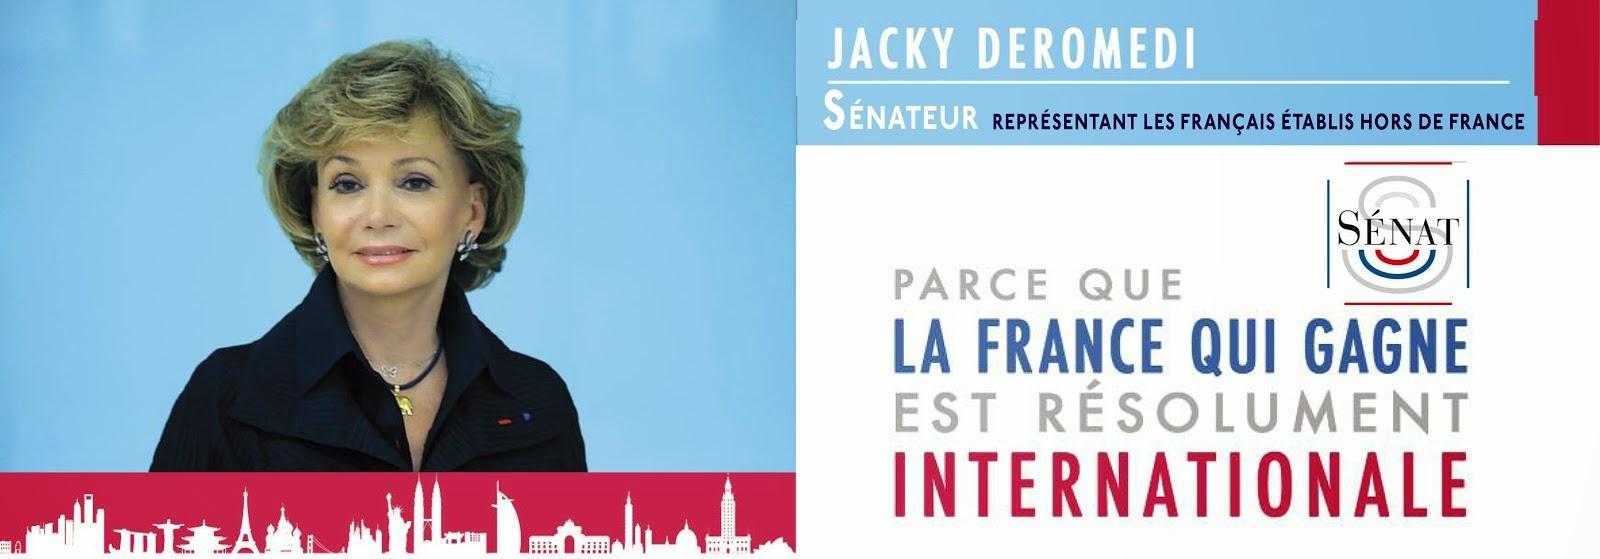 Jacky Deromedi